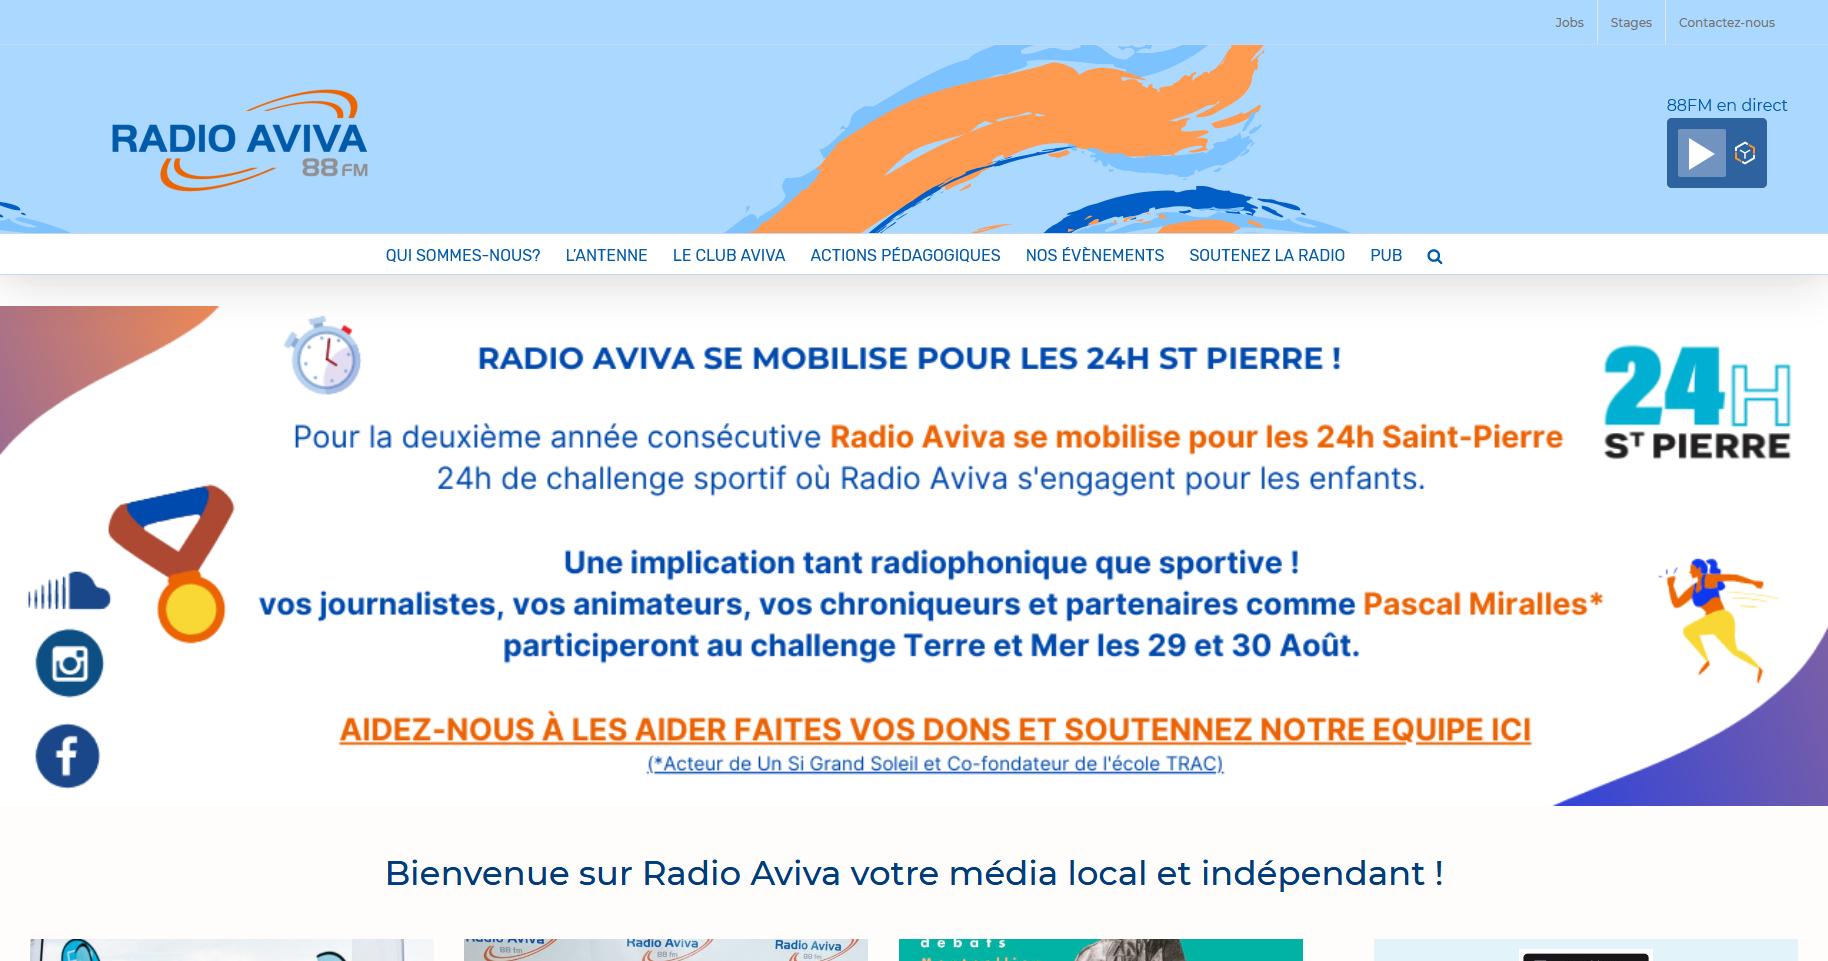 Radio-aviva.com